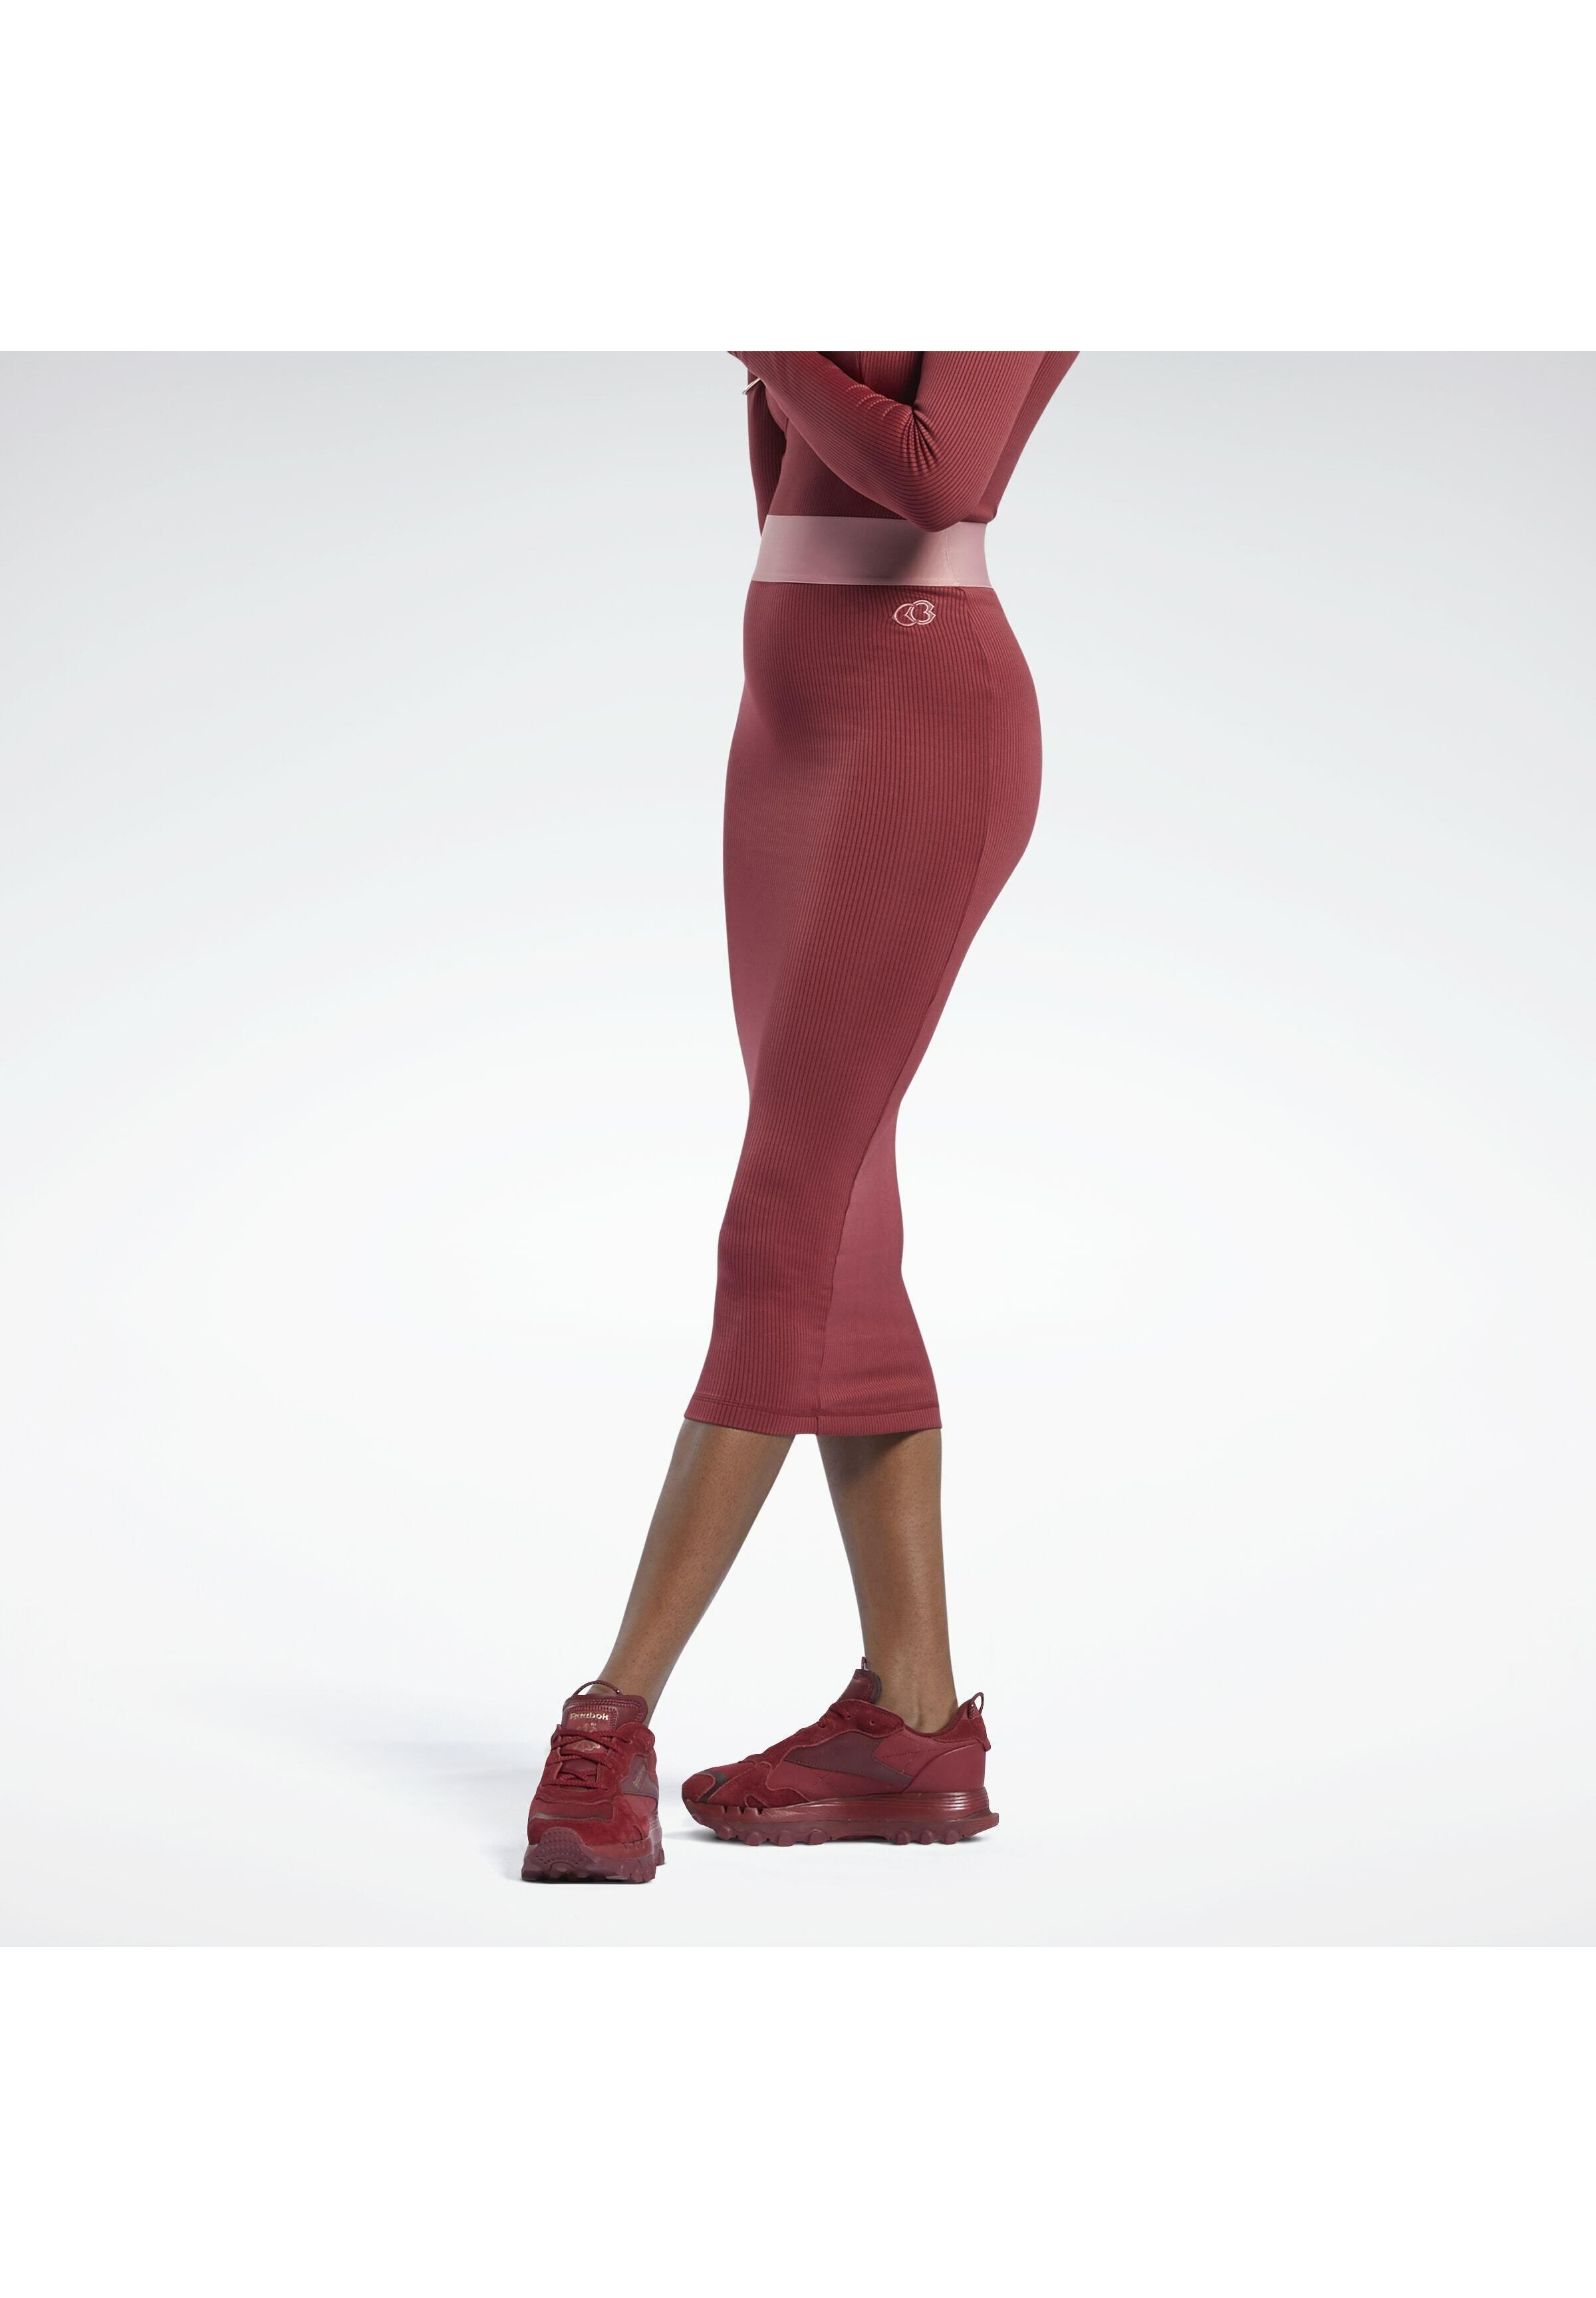 Femme CARDI B RIB - Jupe crayon